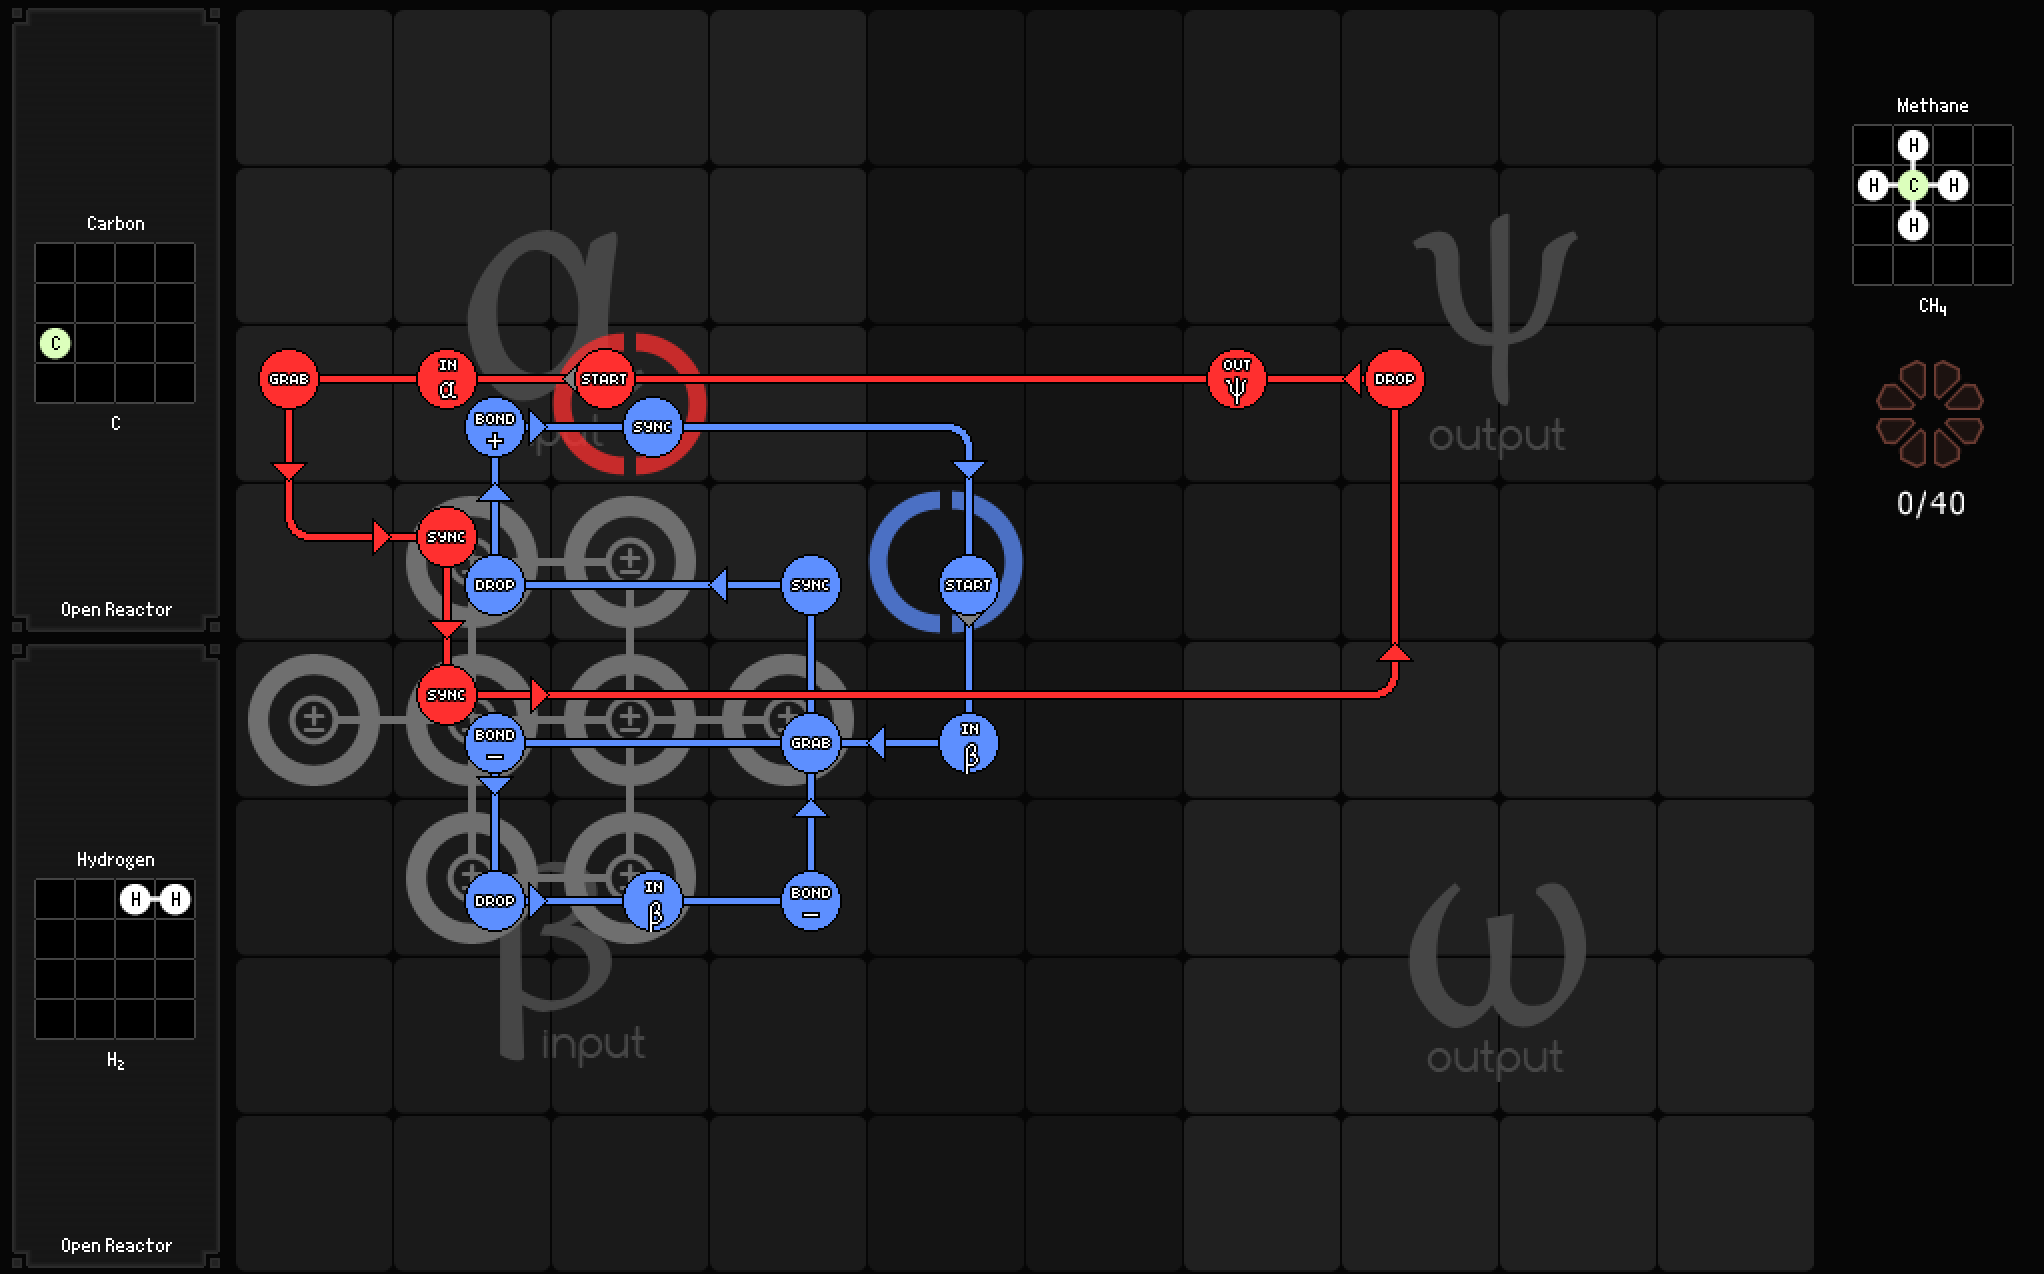 1_Story_Mode/6_Hephaestus_IV/SpaceChem-6.6.a/Reactor_4.png